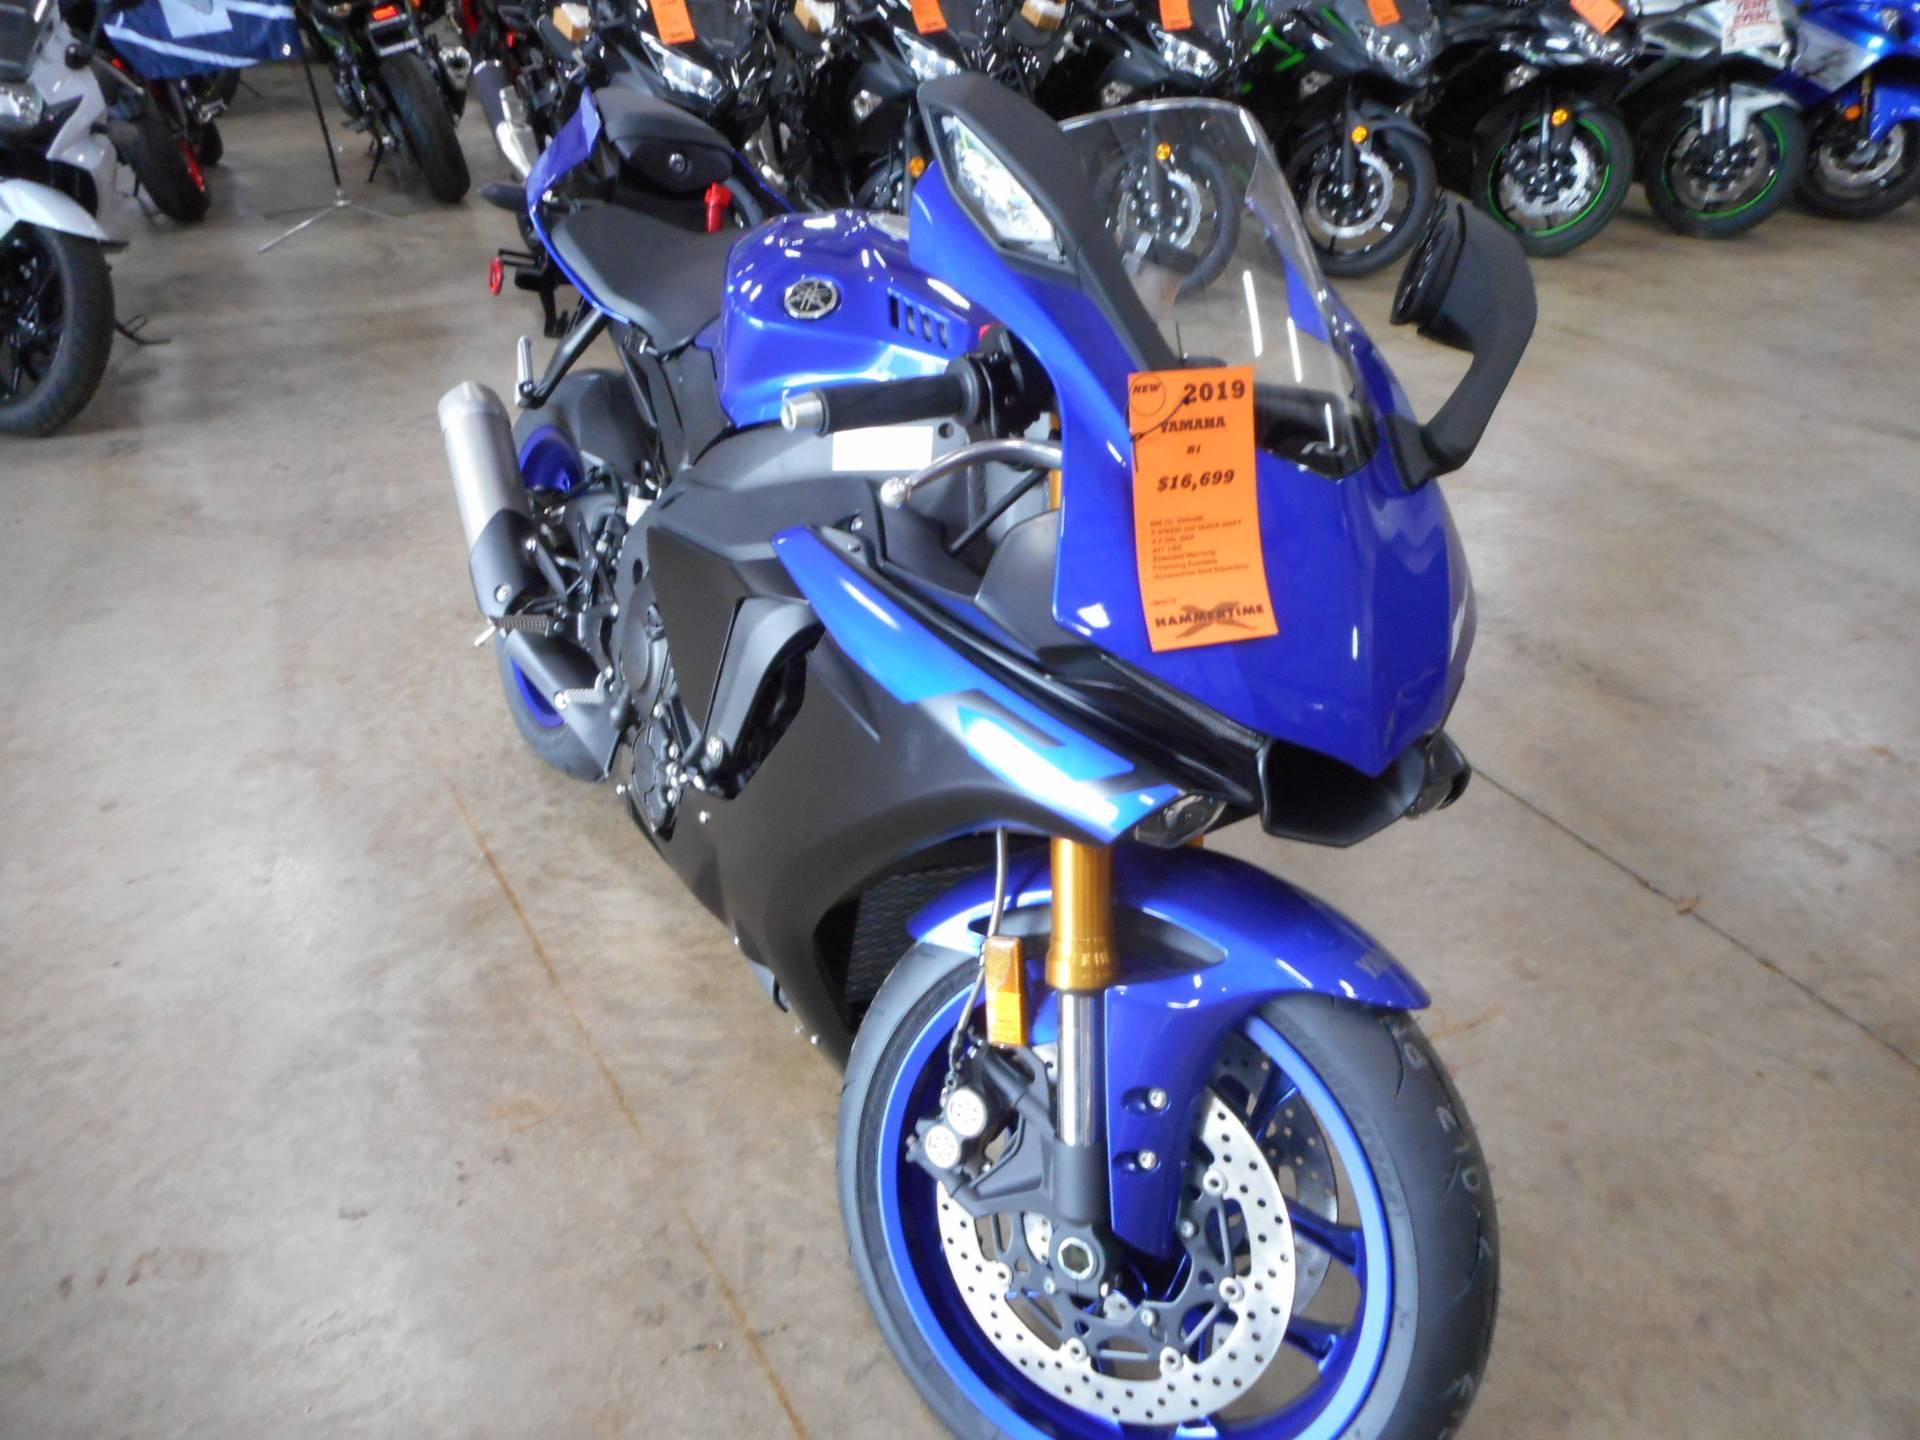 2019 Yamaha Yzf R1 In Belvidere Illinois